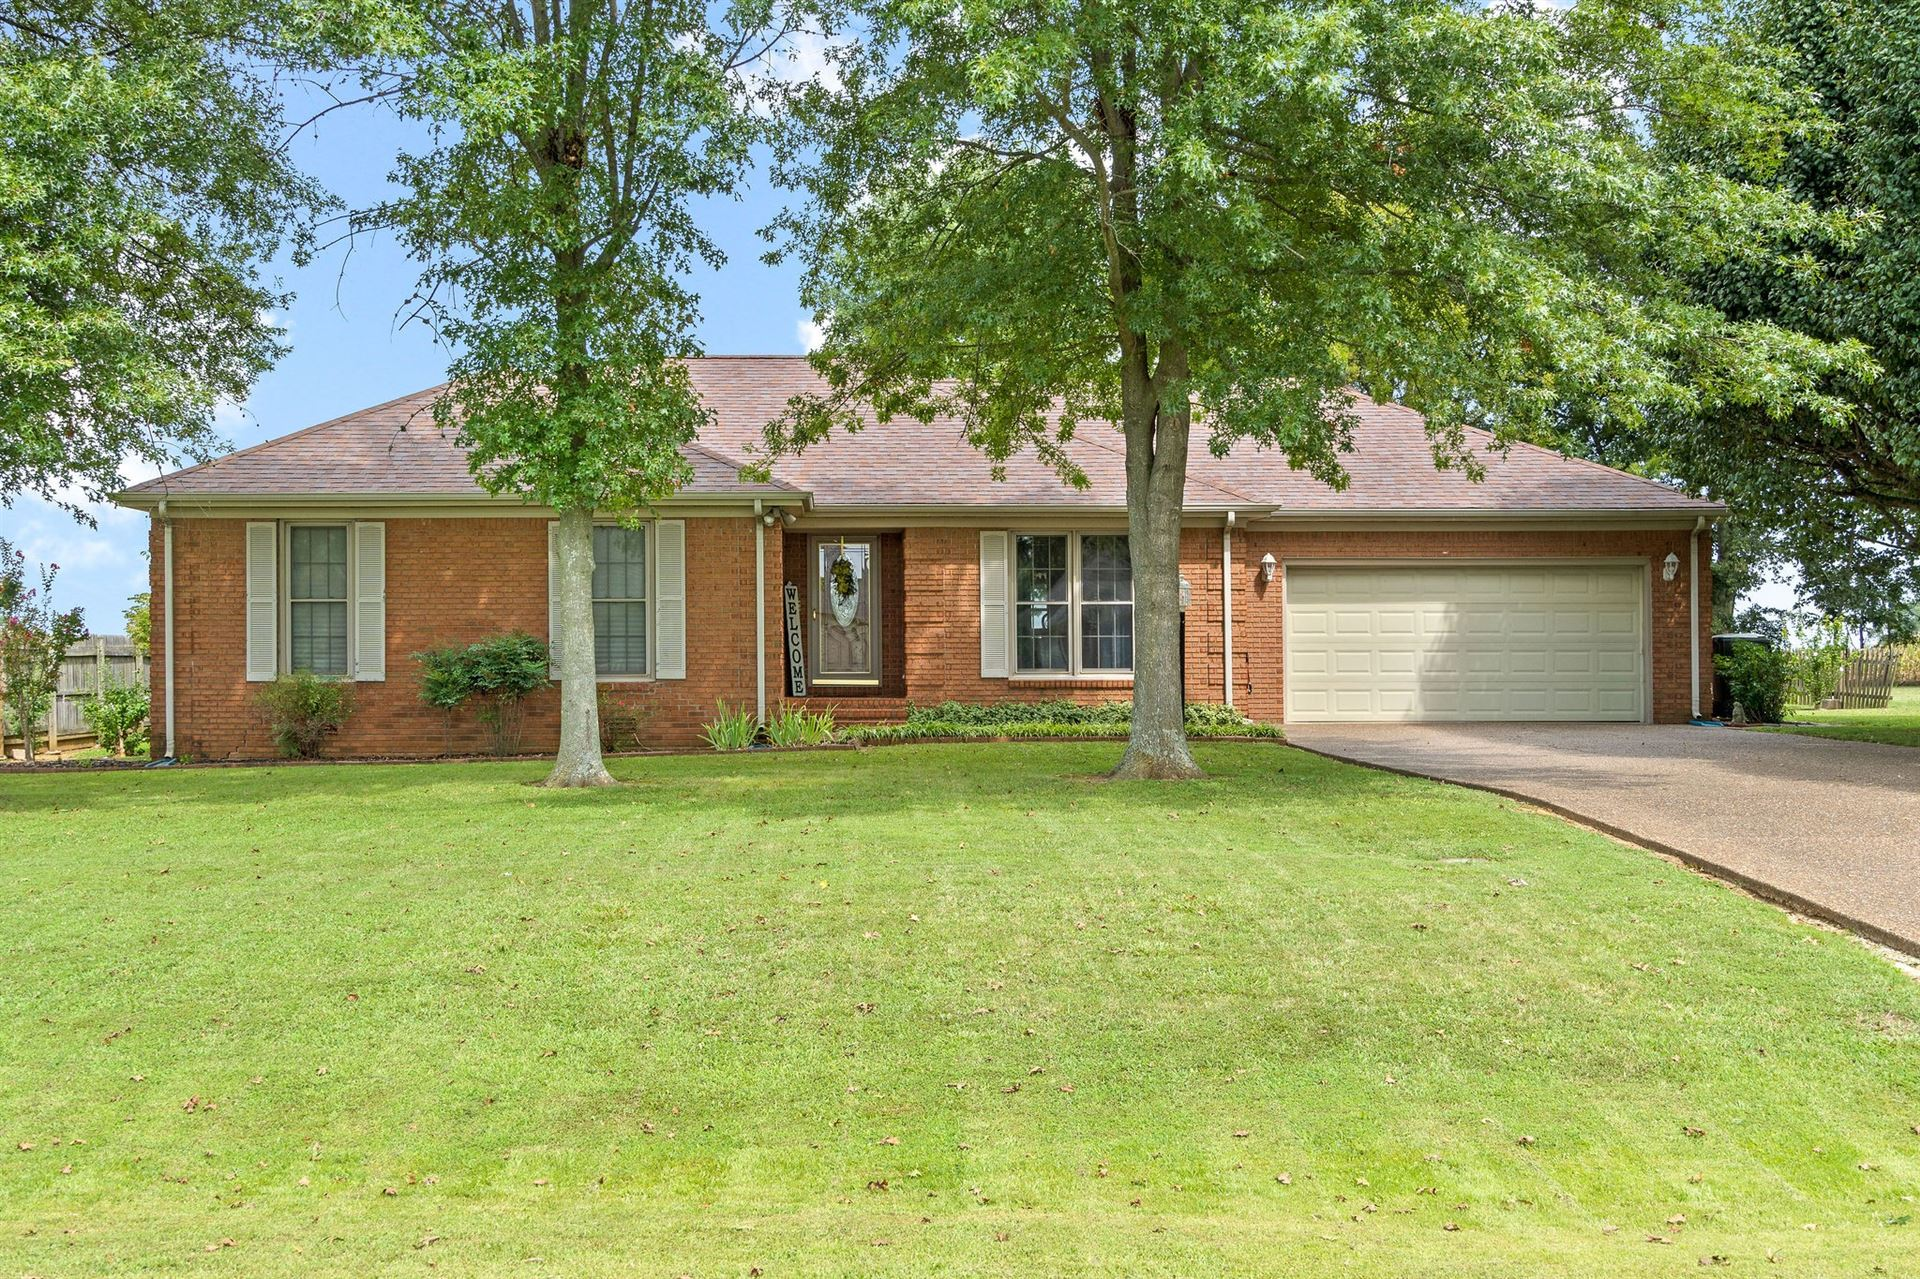 1418 N Shallow Lake Cir, Hopkinsville, KY 42240 - MLS#: 2287203